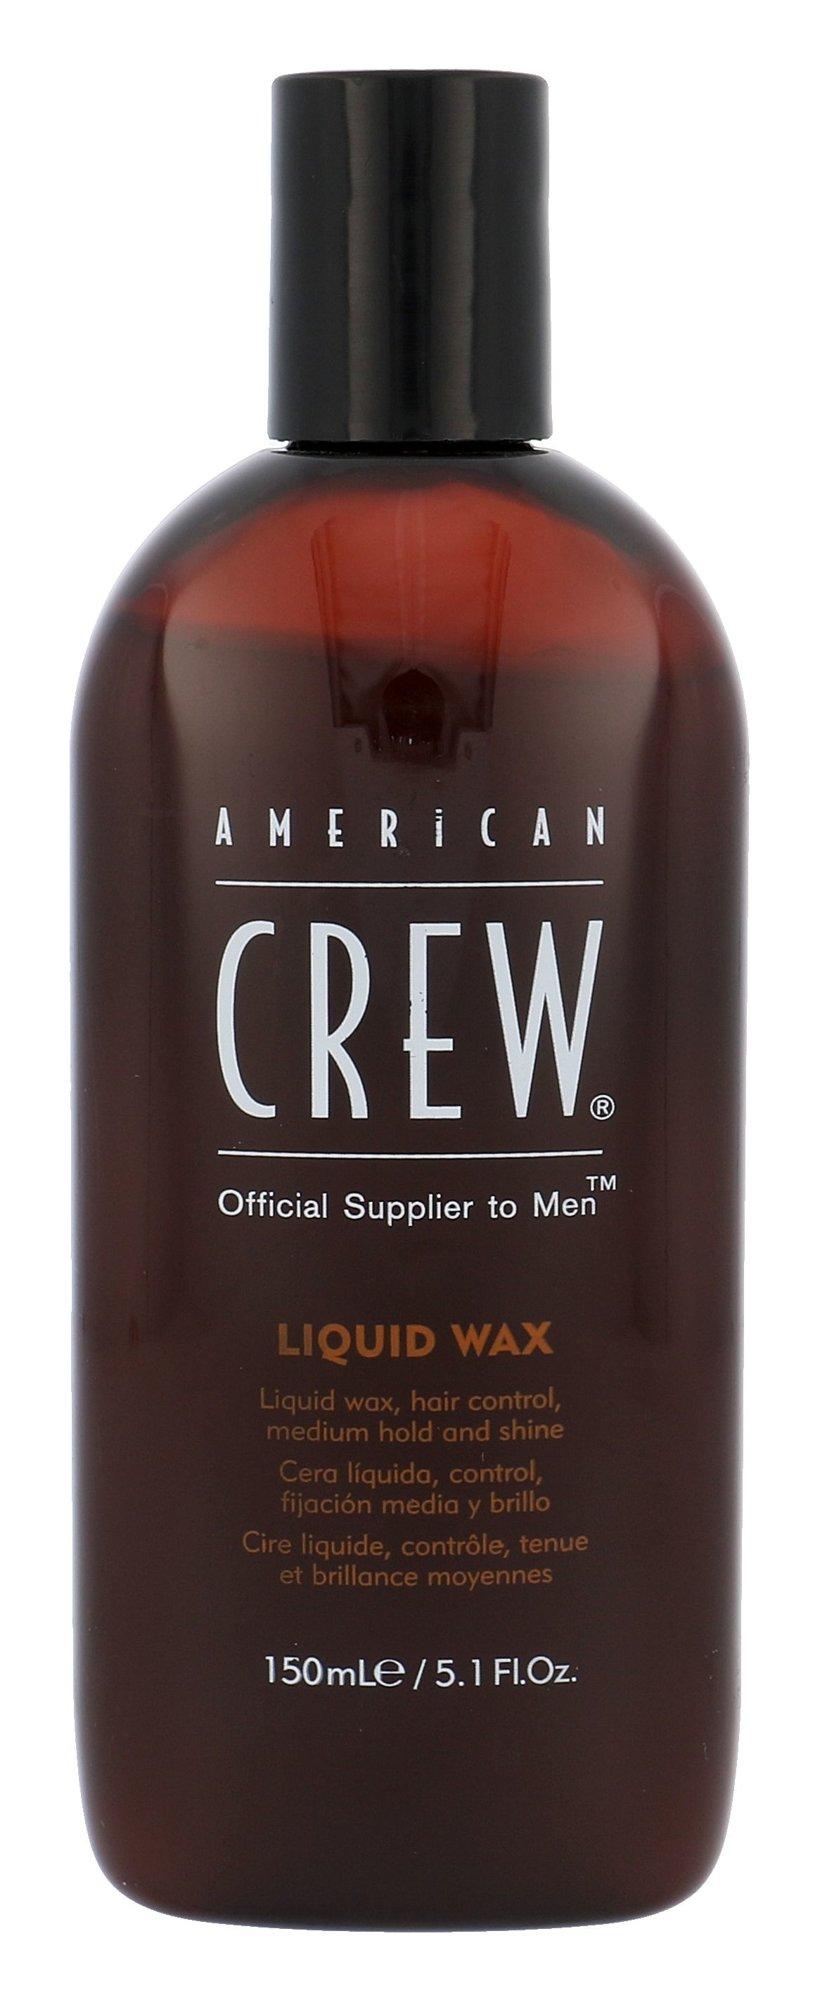 American Crew Liquid Wax Cosmetic 150ml